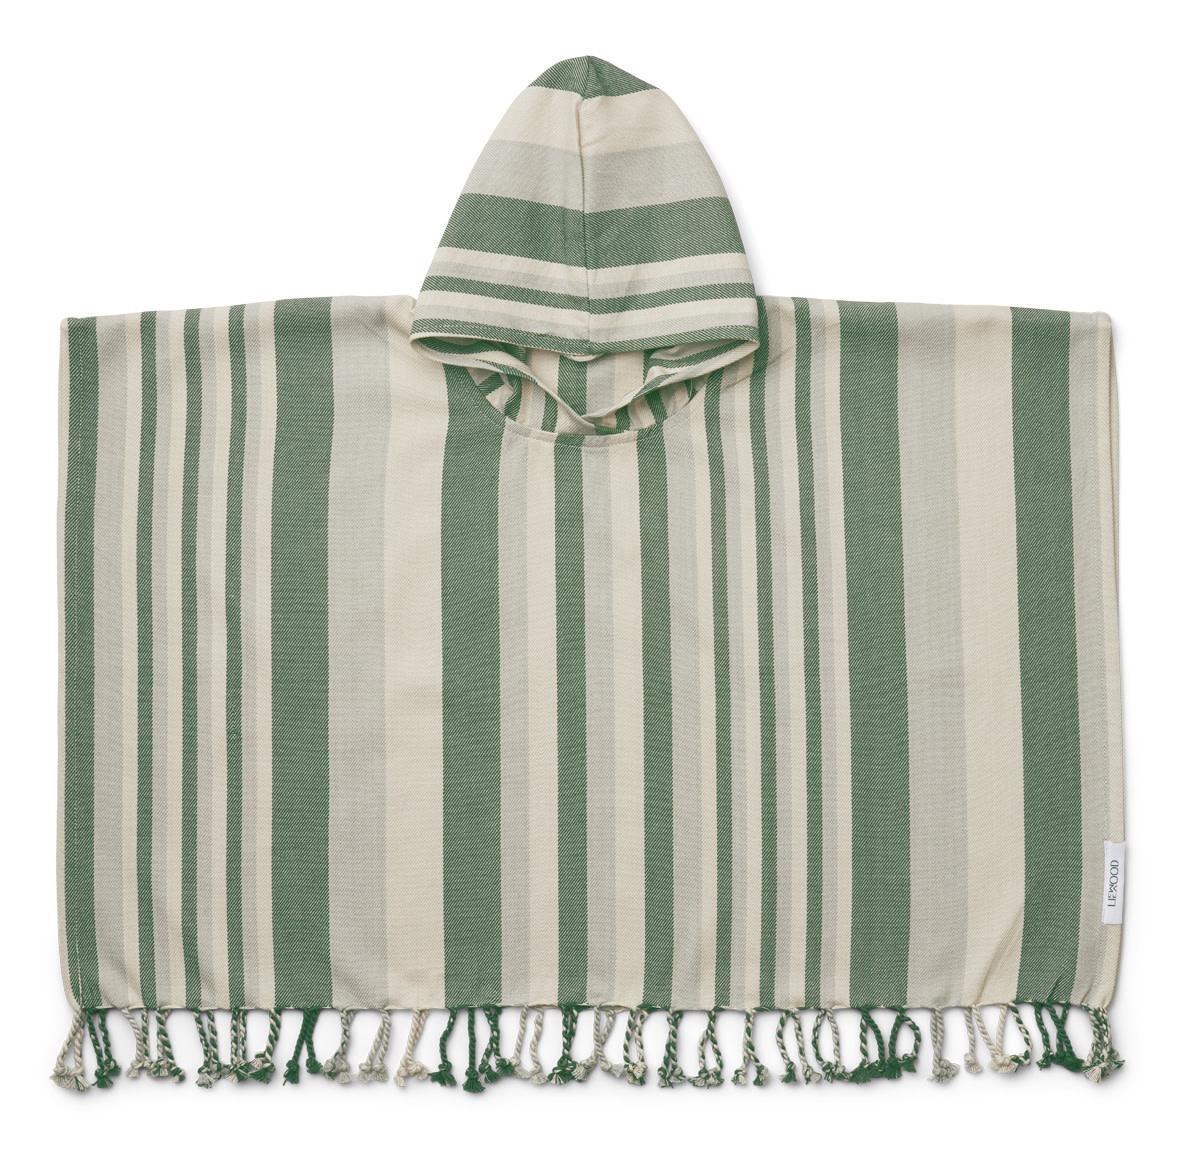 Roomie poncho stripe garden green/sandy/dove blue-1